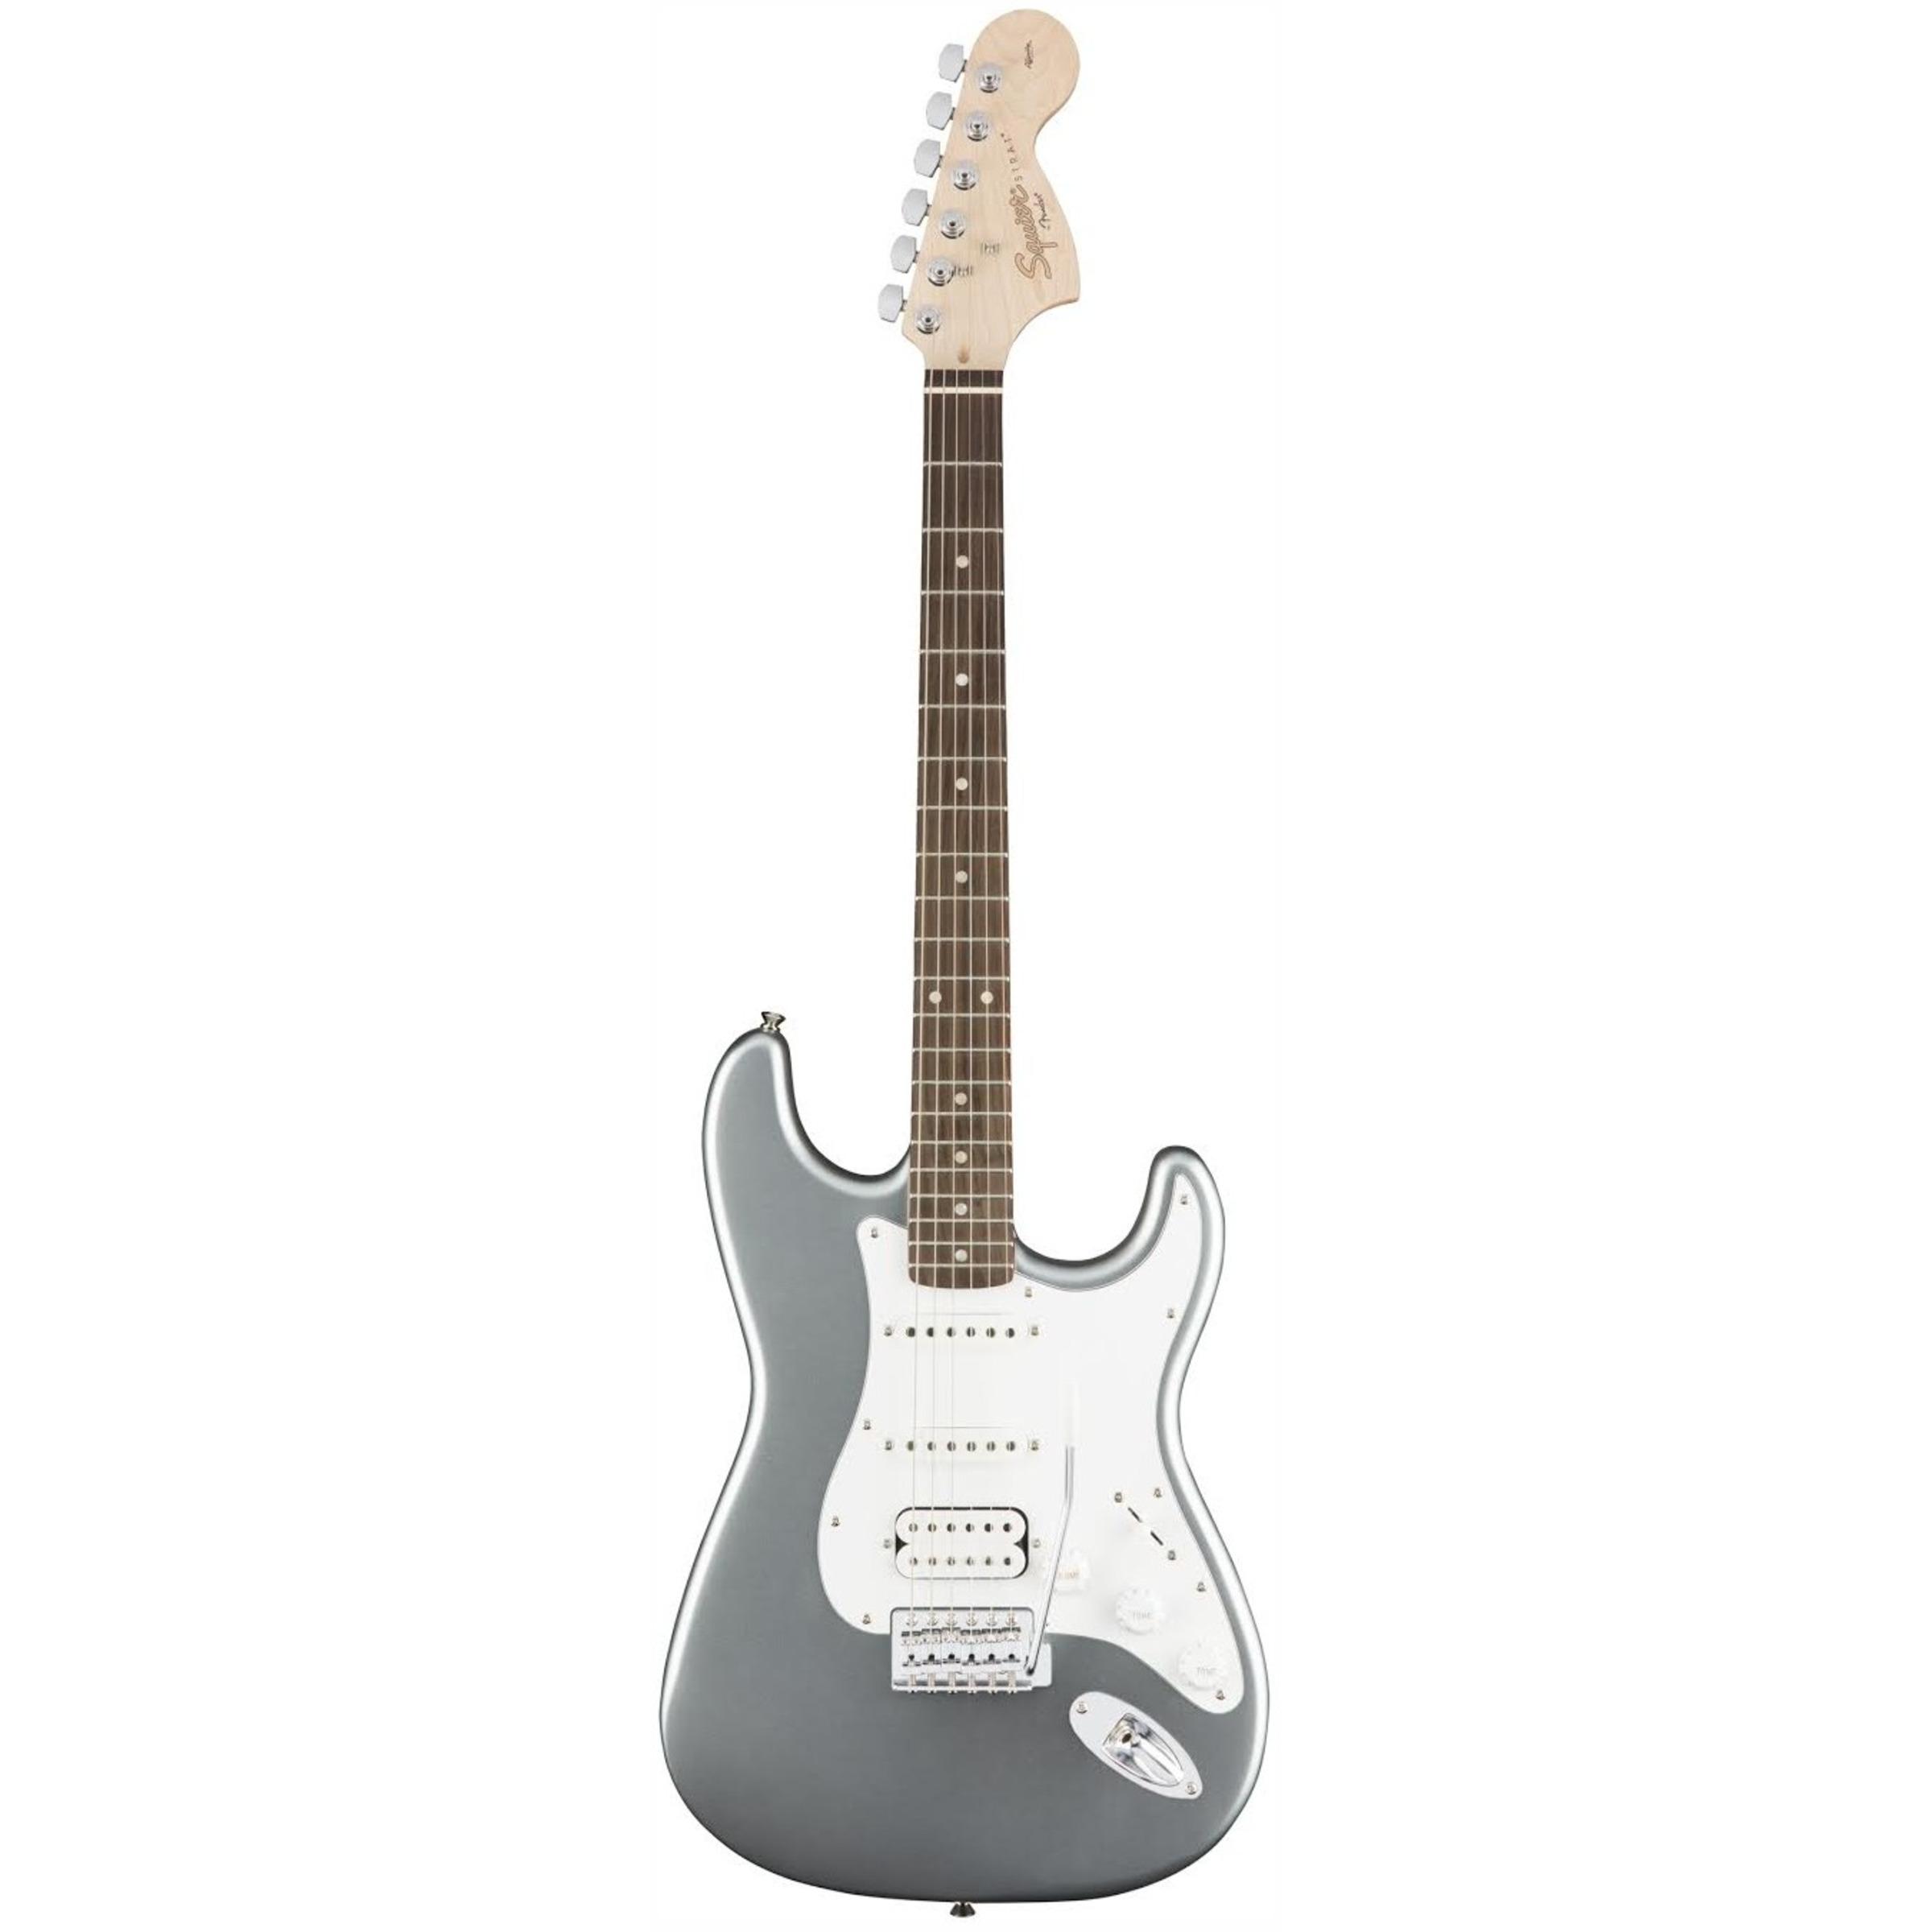 squier affinity stratocaster hss electric guitar giggear. Black Bedroom Furniture Sets. Home Design Ideas